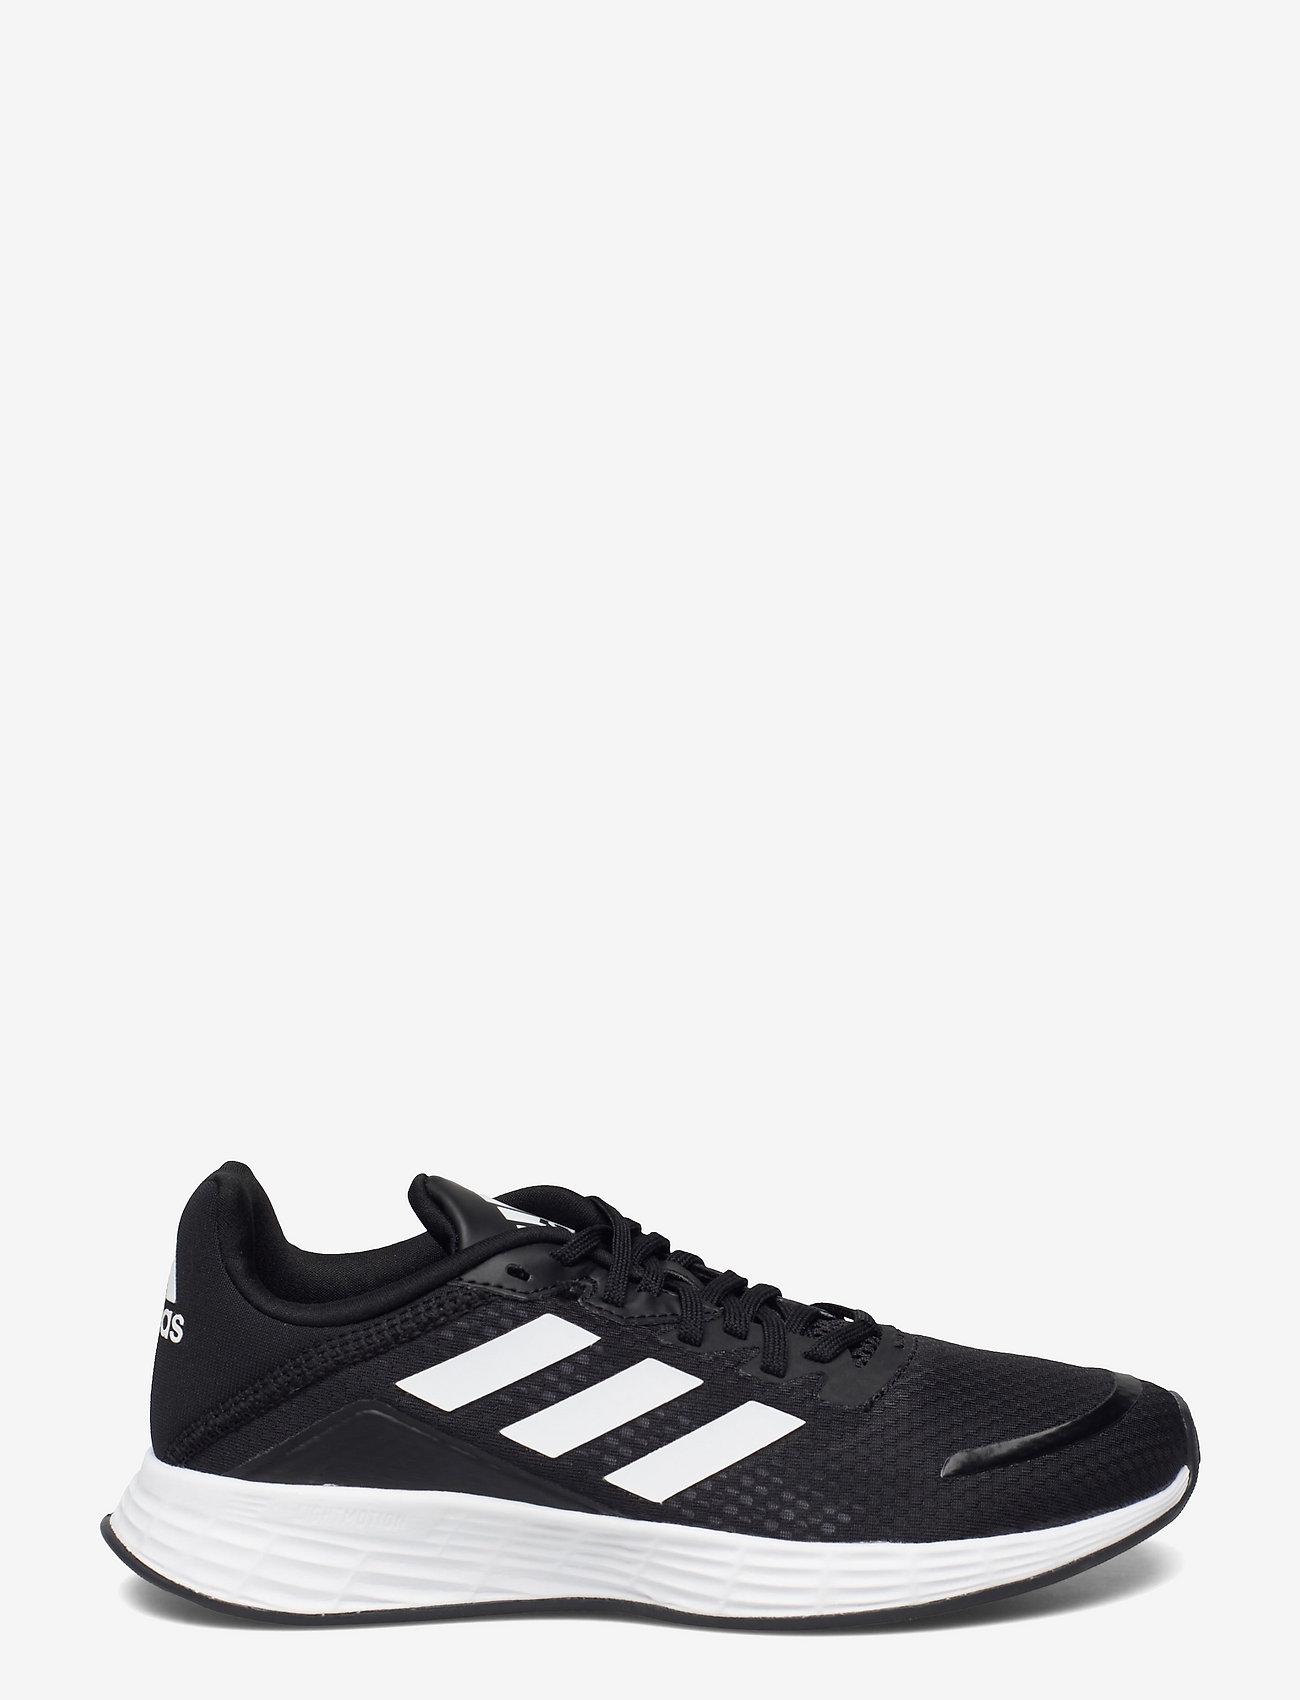 adidas Performance - Duramo SL  W - running shoes - cblack/ftwwht/carbon - 1